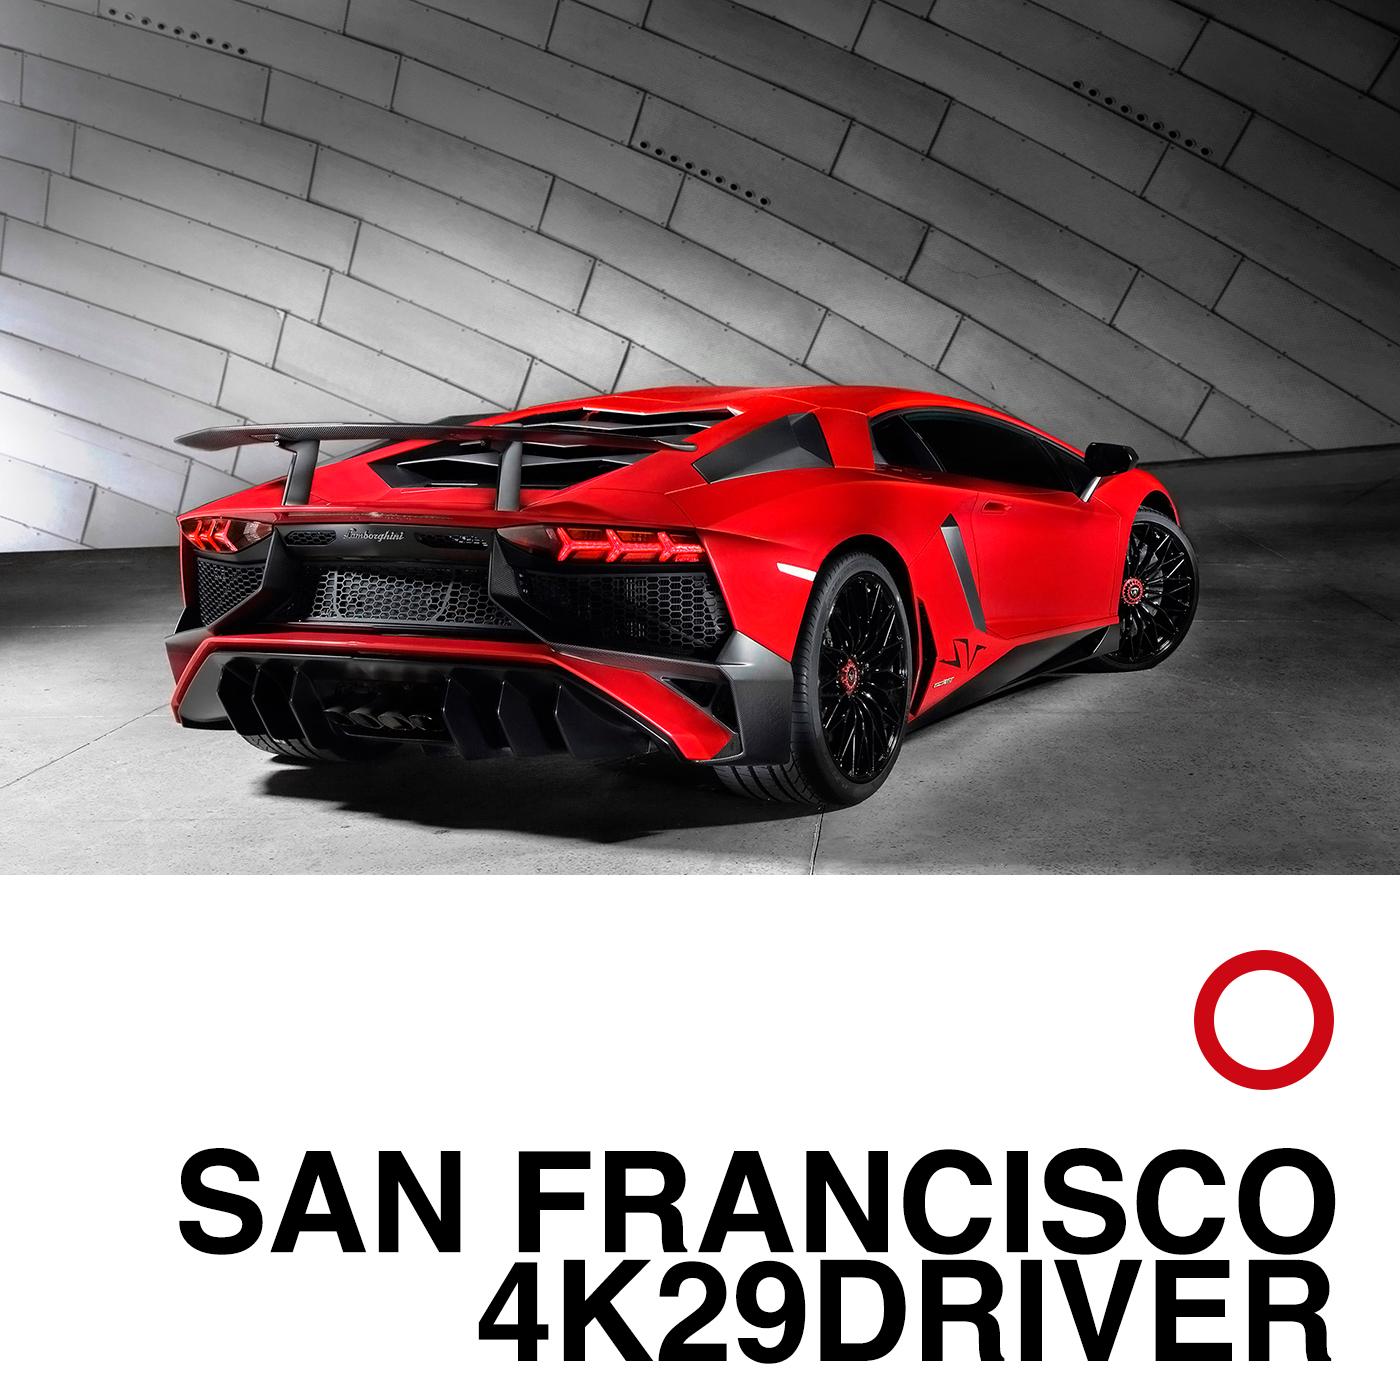 SAN FRANCISCO 4K29DRIVER